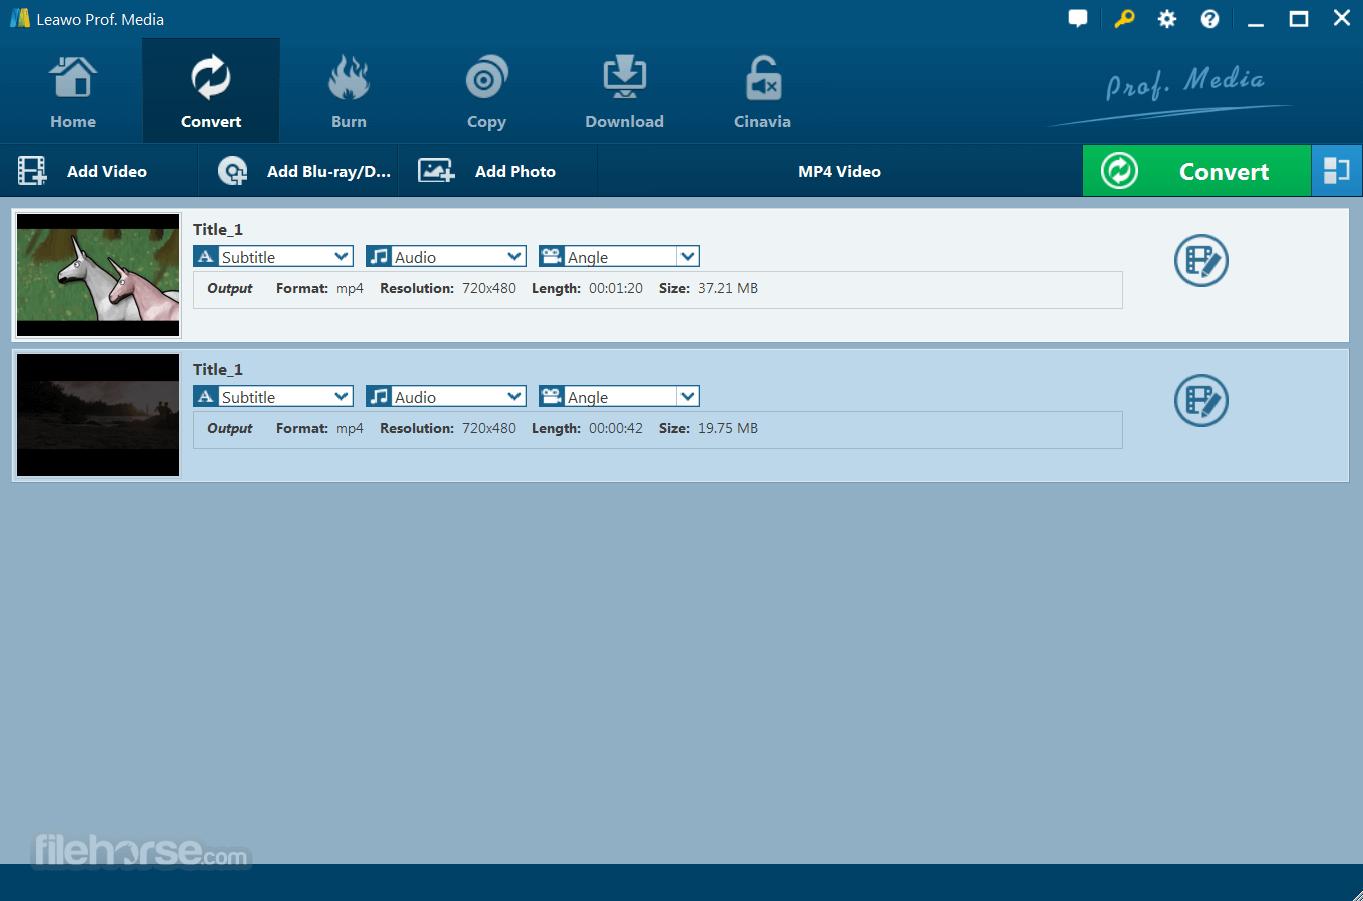 Leawo Blu-ray Ripper 8.3.0.0 Screenshot 1